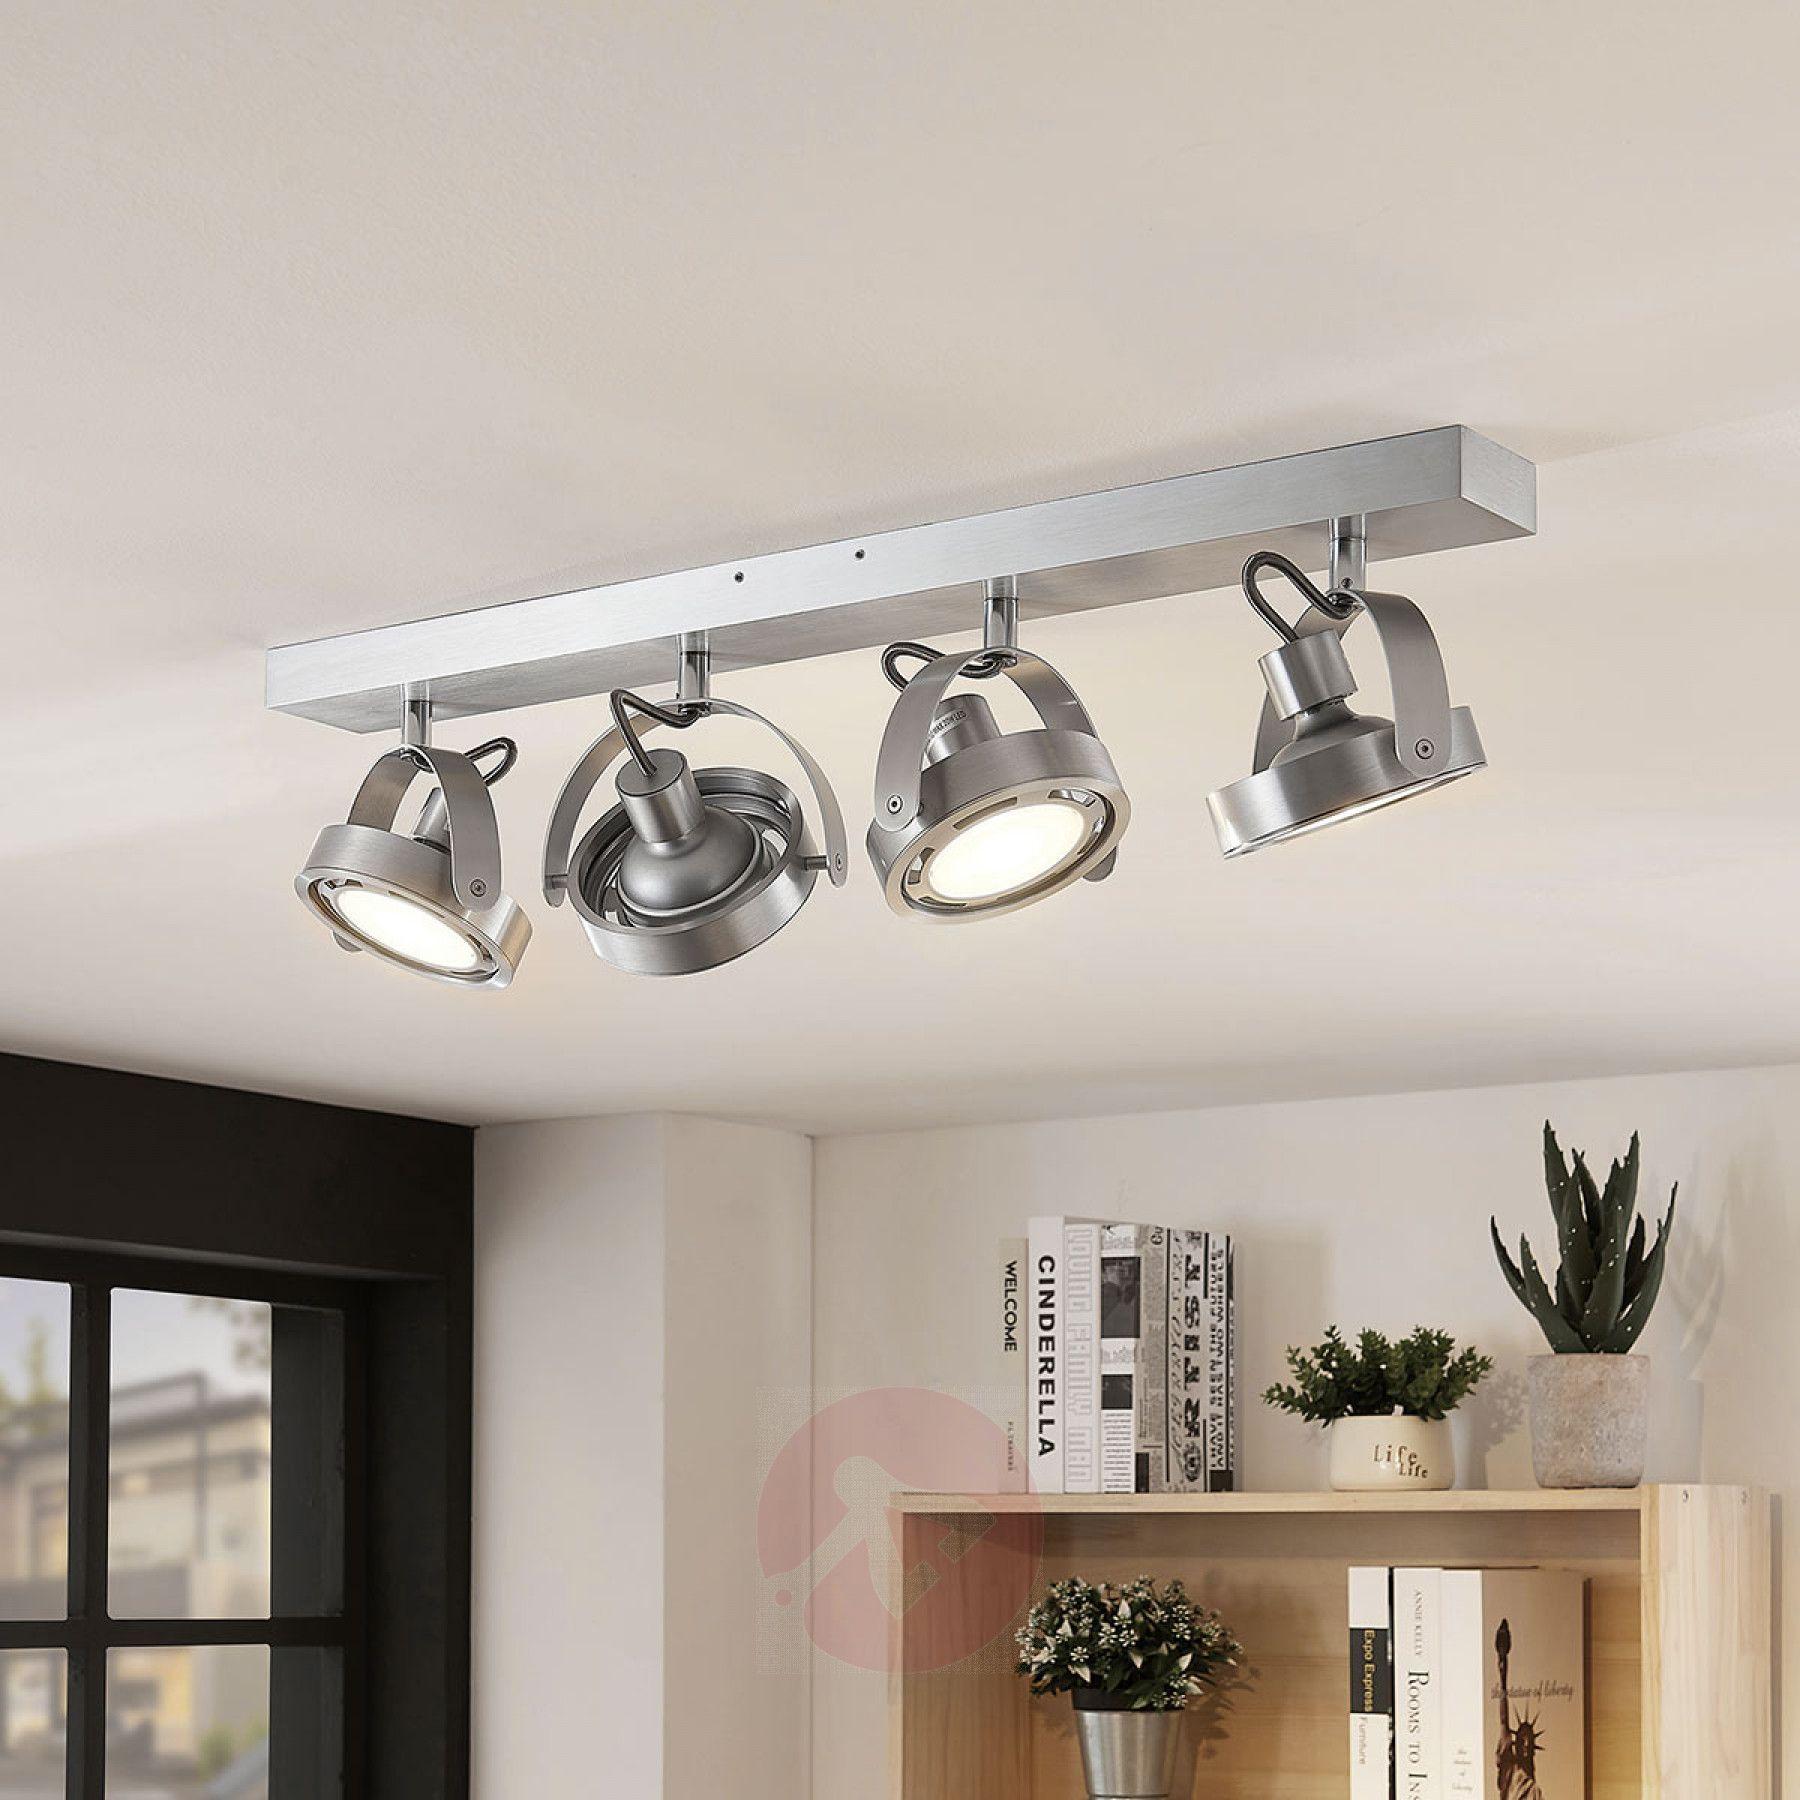 LED Strahler Munin, dimmbar, alu, 4 flammig | Lampenwelt.at